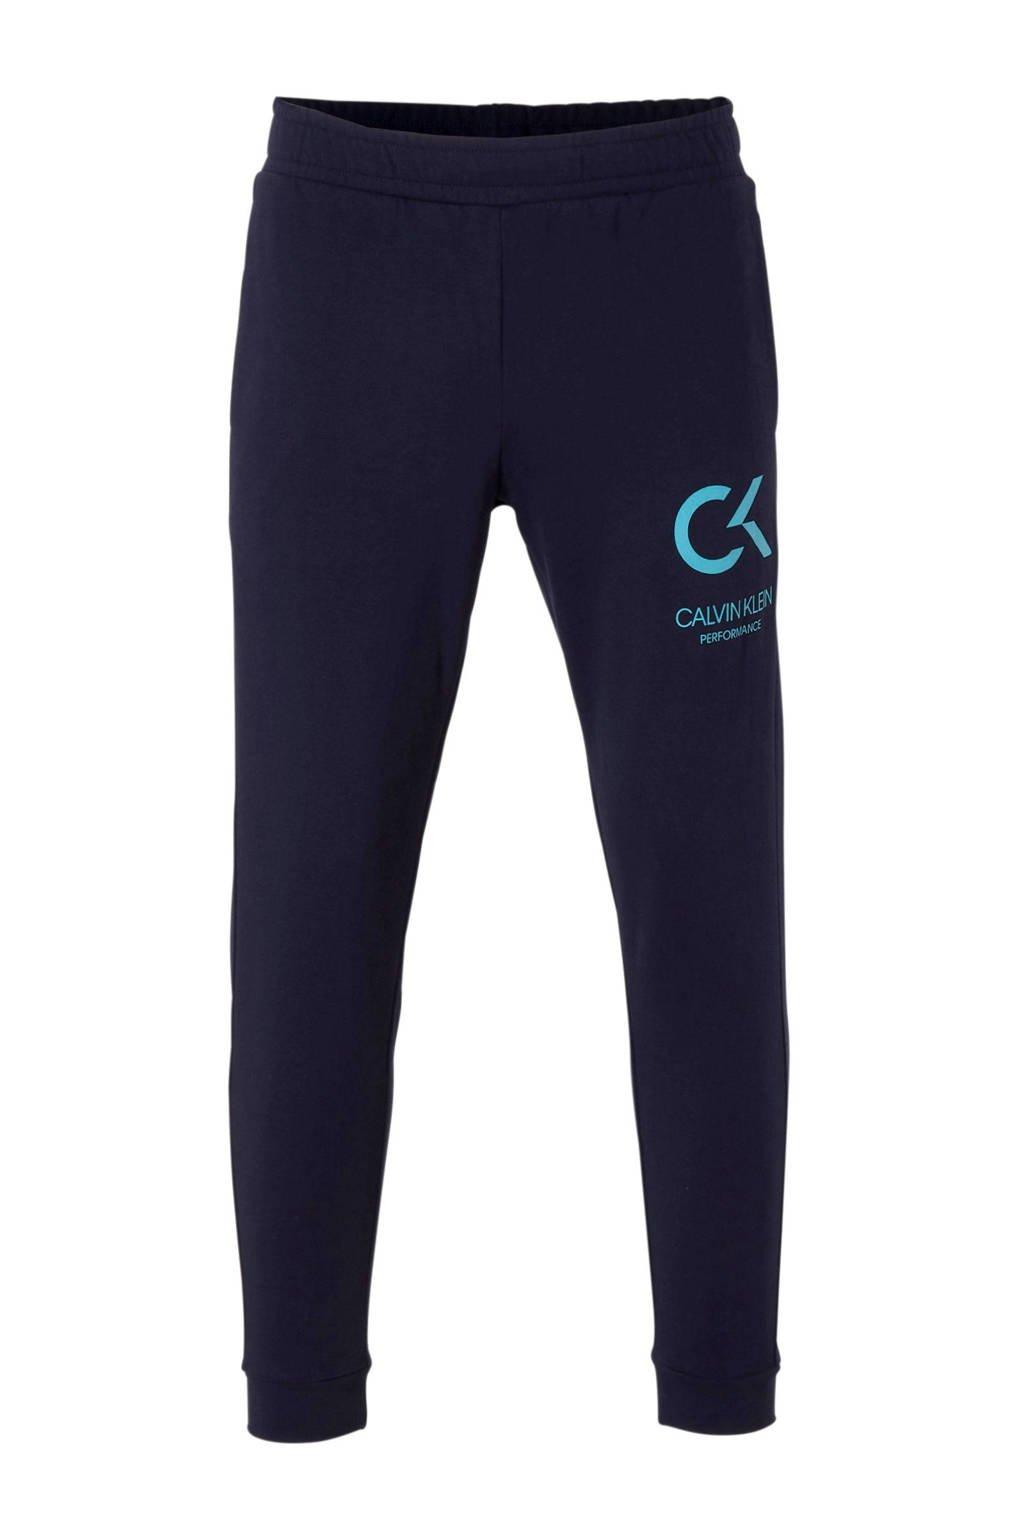 CALVIN KLEIN PERFORMANCE   7/8 joggingbroek donkerblauw, Donkerblauw